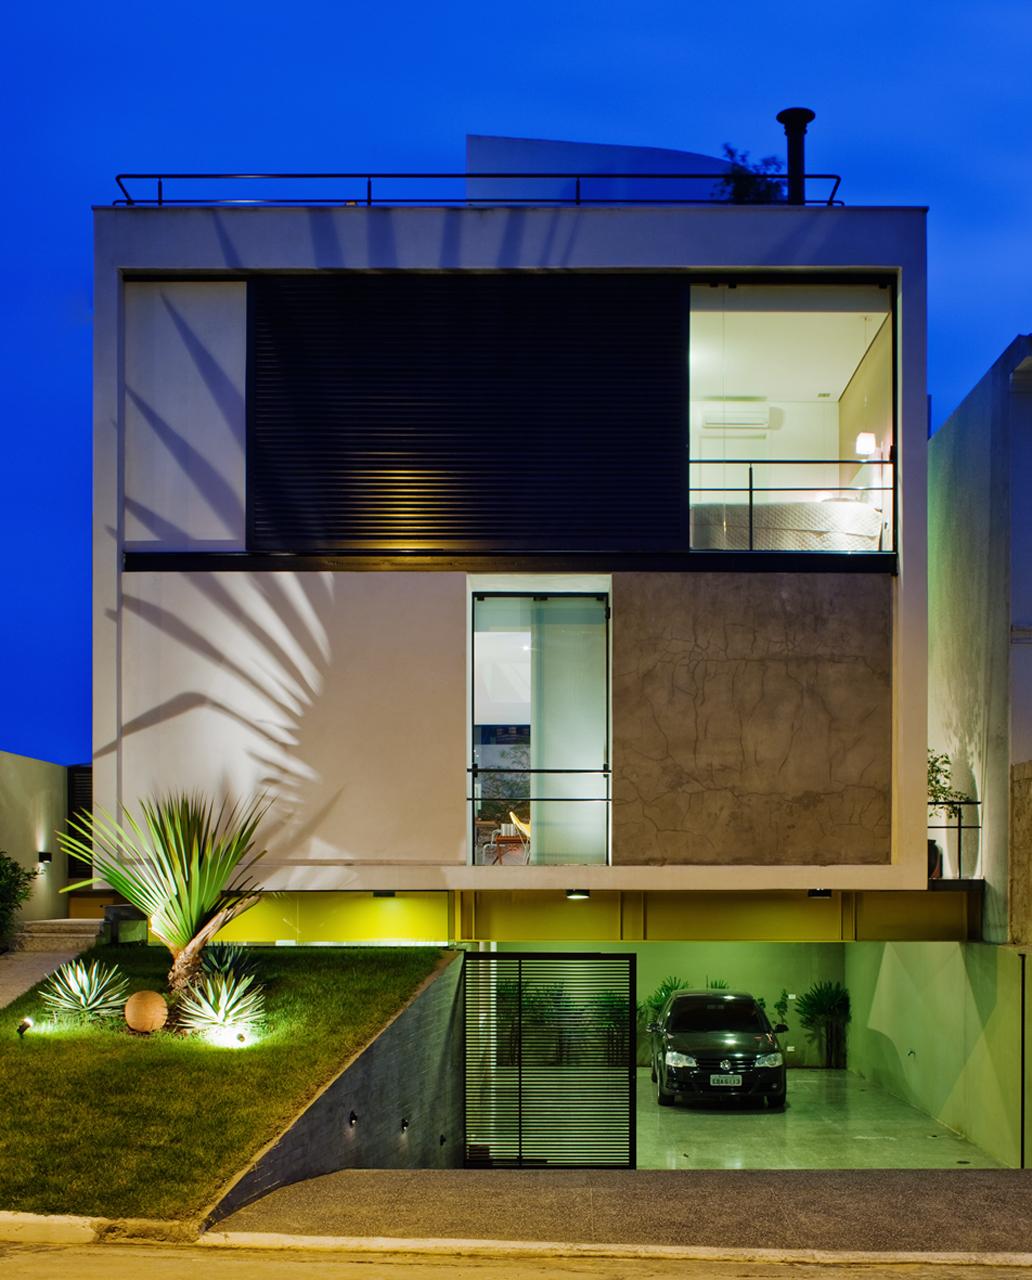 Casa Mirante do Horto / Flavio Castro Arquitetos, © Nelson Kon